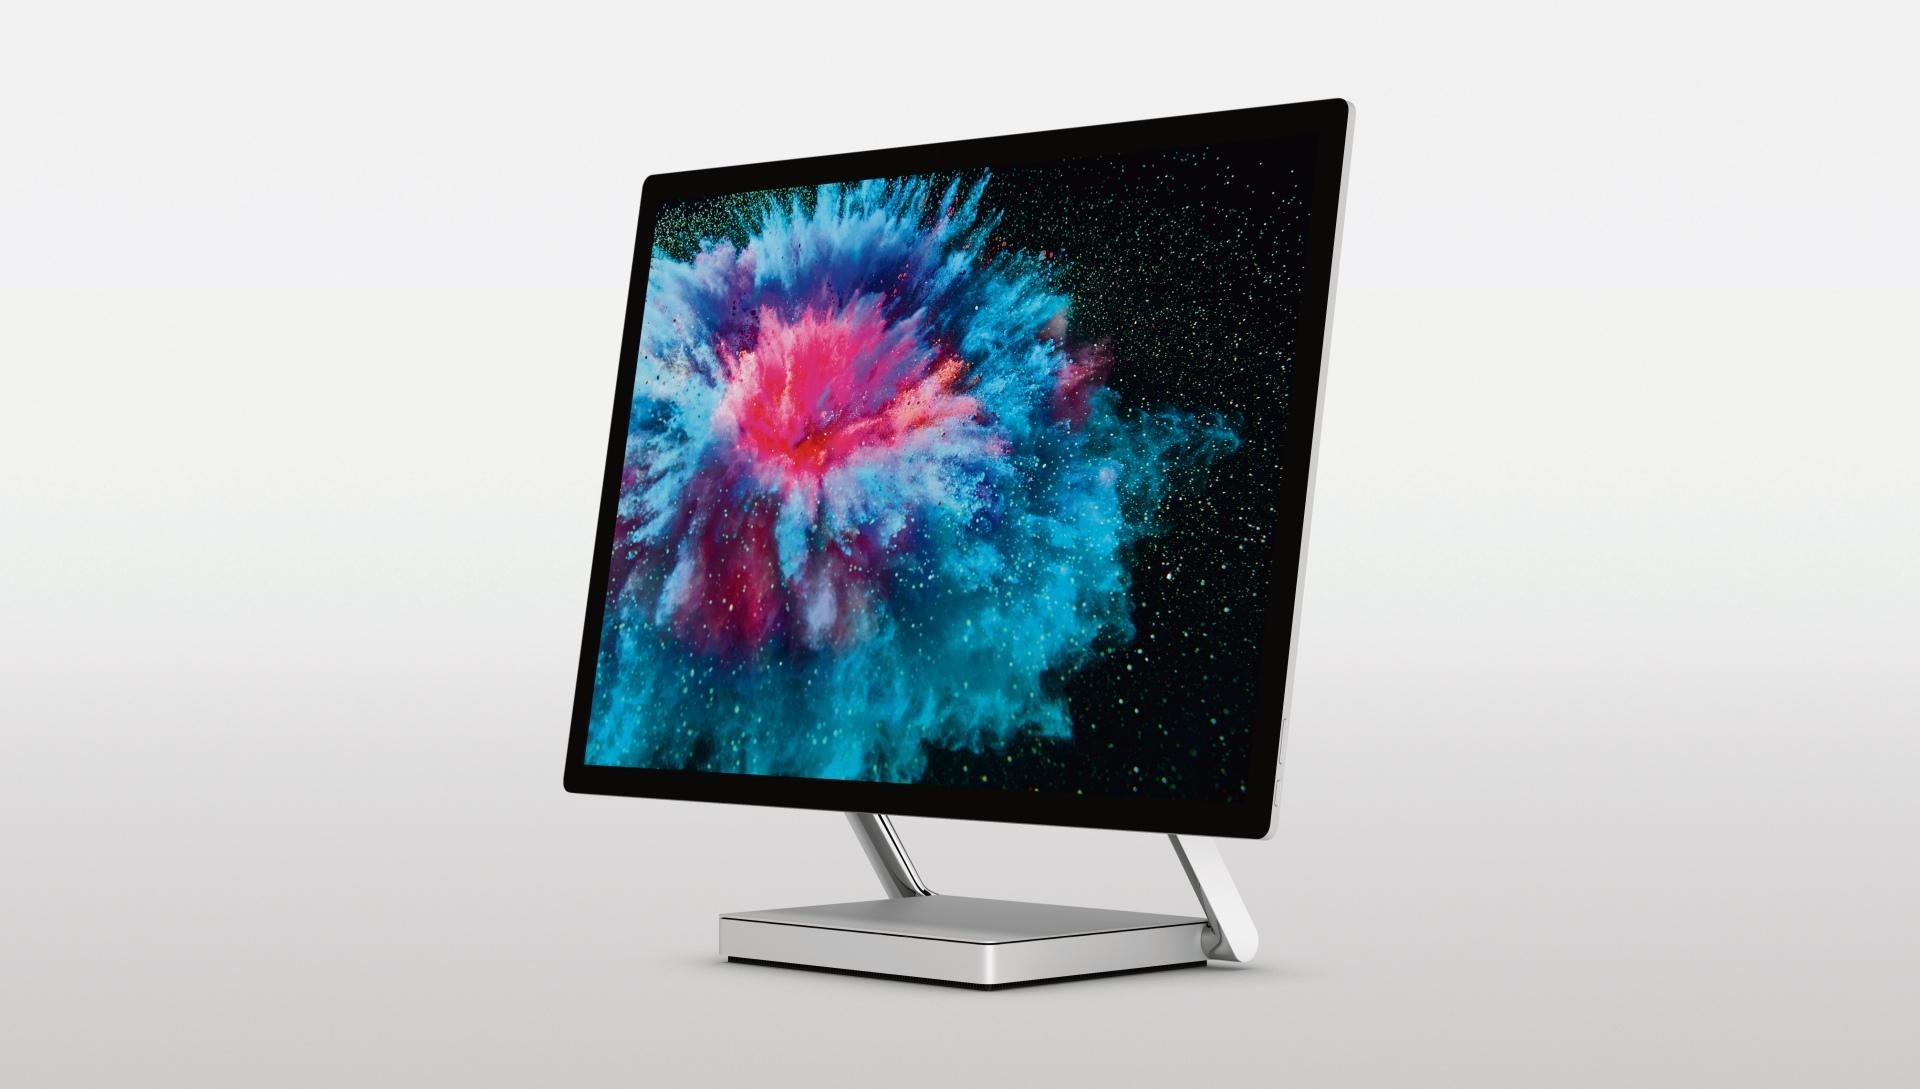 Surface Studio 2 review: Microsoft's shape-shifting iMac killer